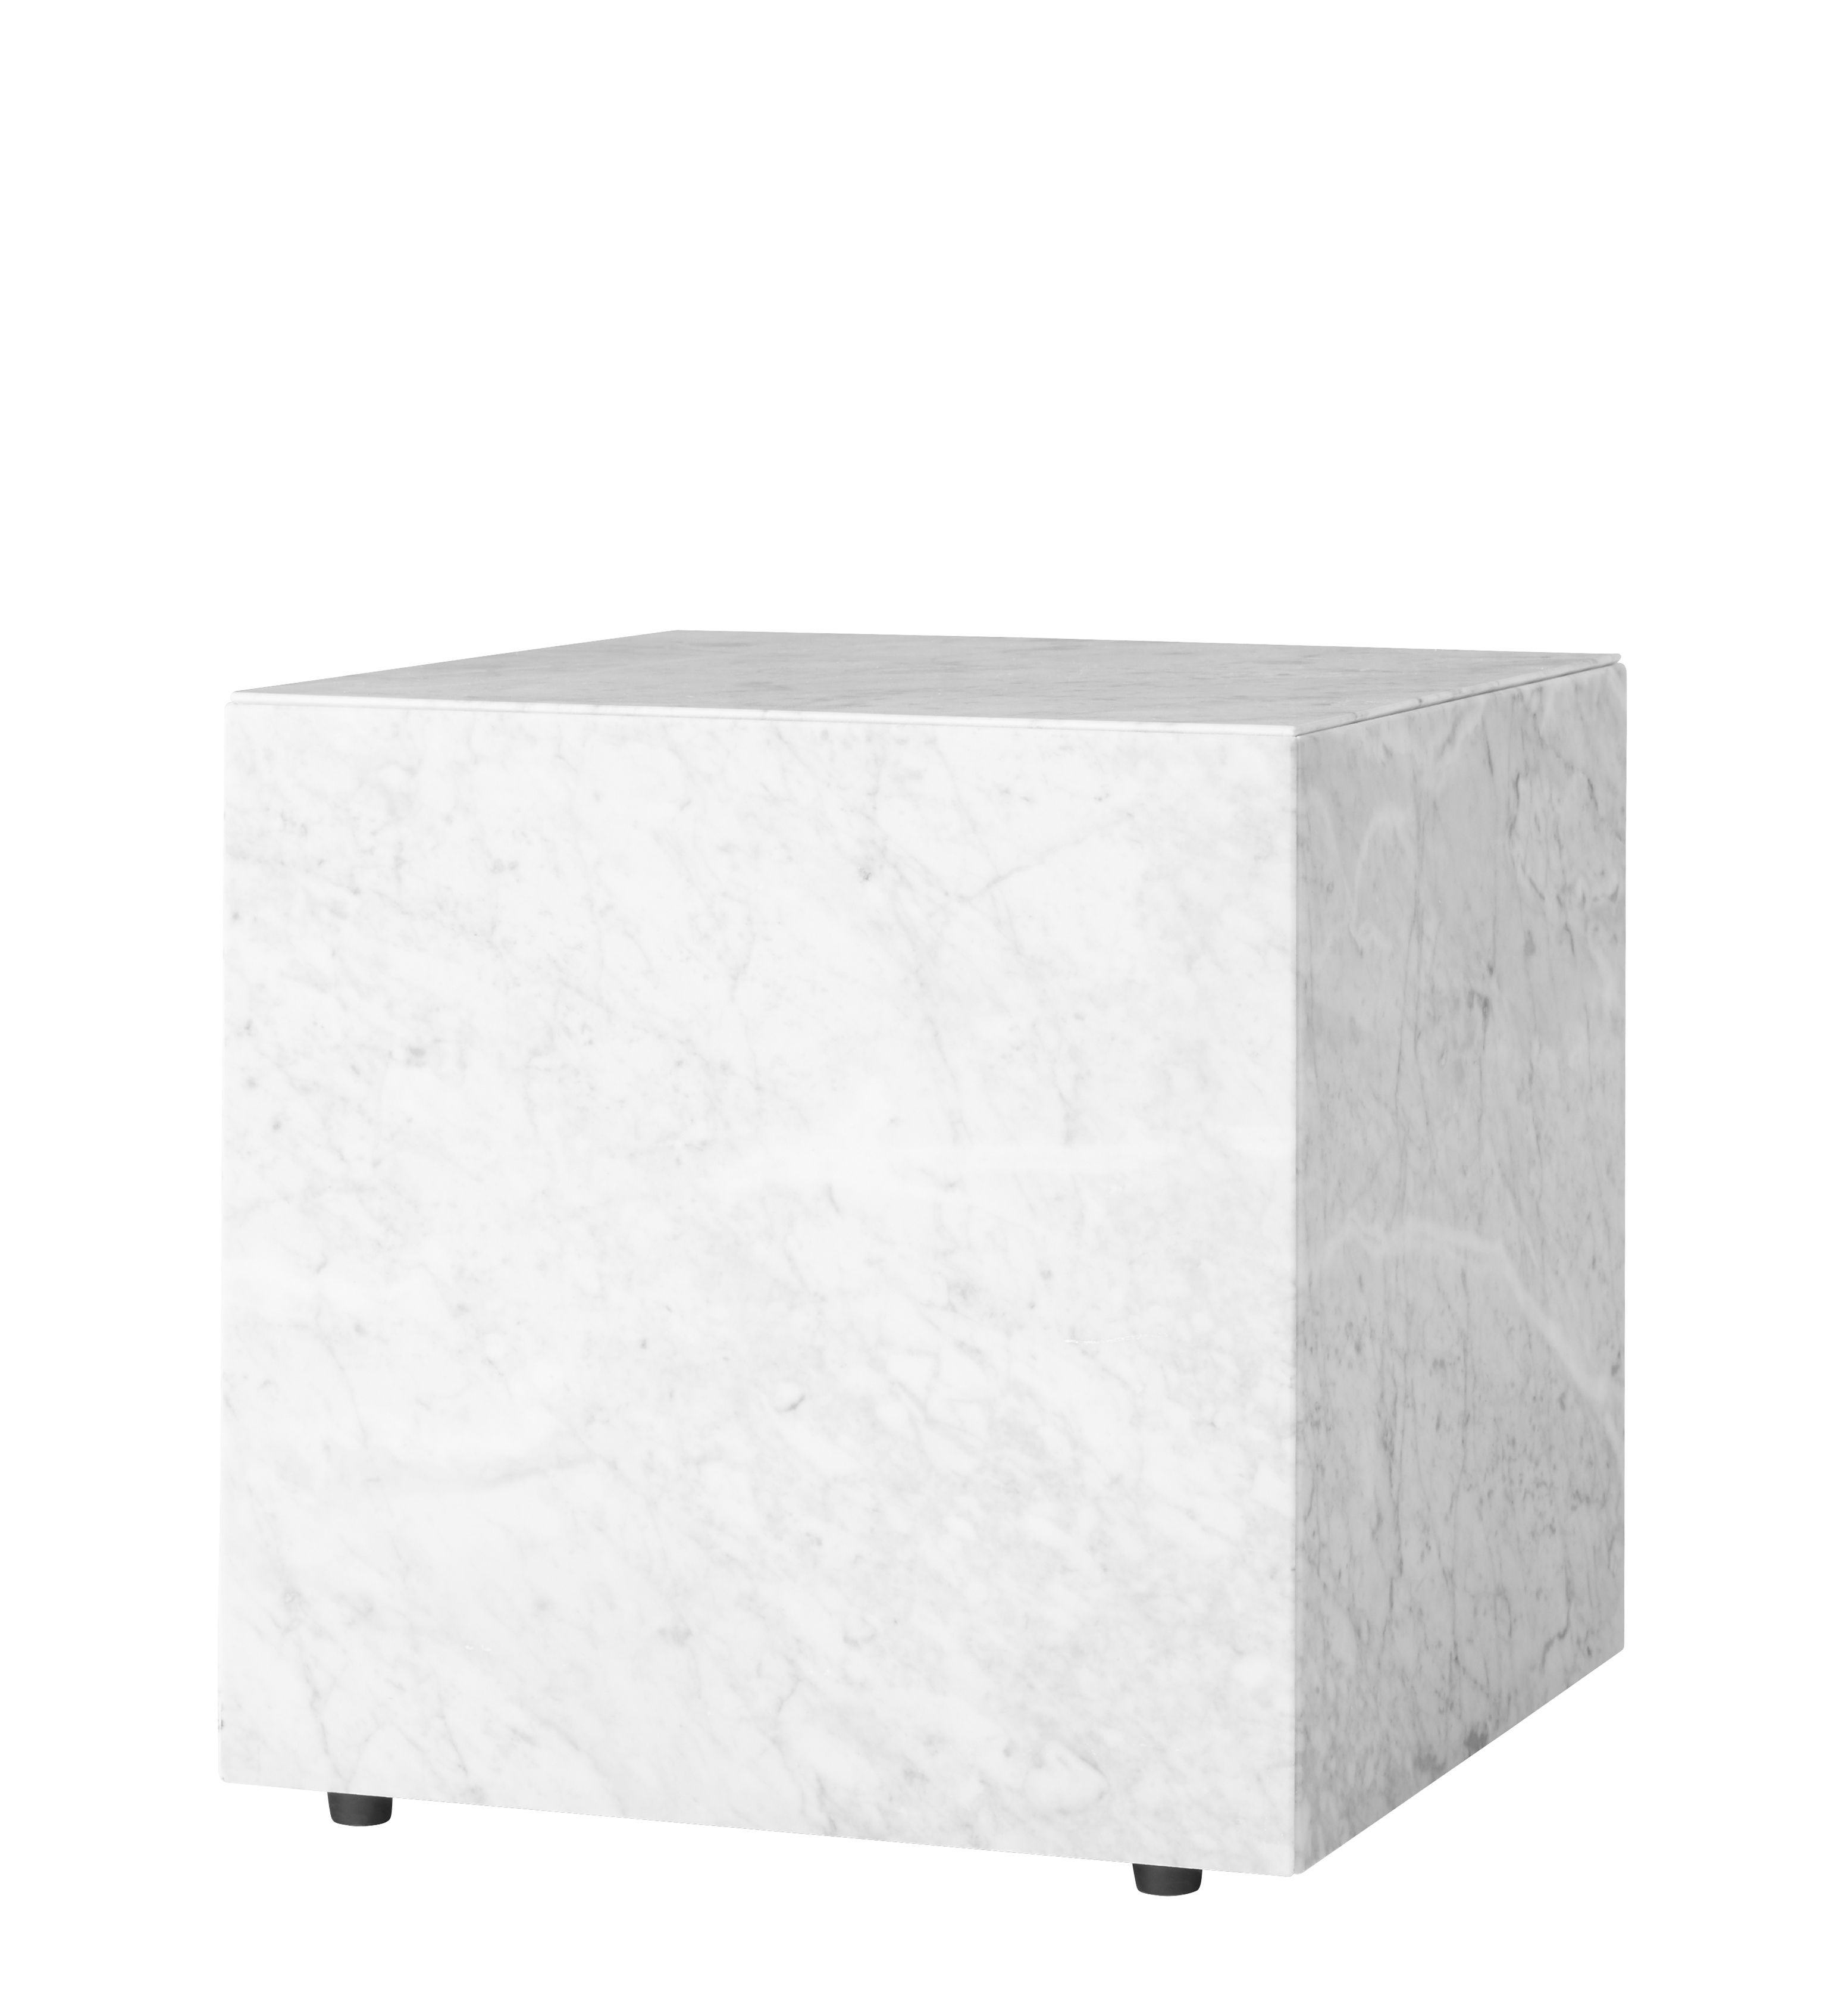 Plinth cubic marmor 40 x 40 x h 40 cm menu for Beistelltisch 80 x 40